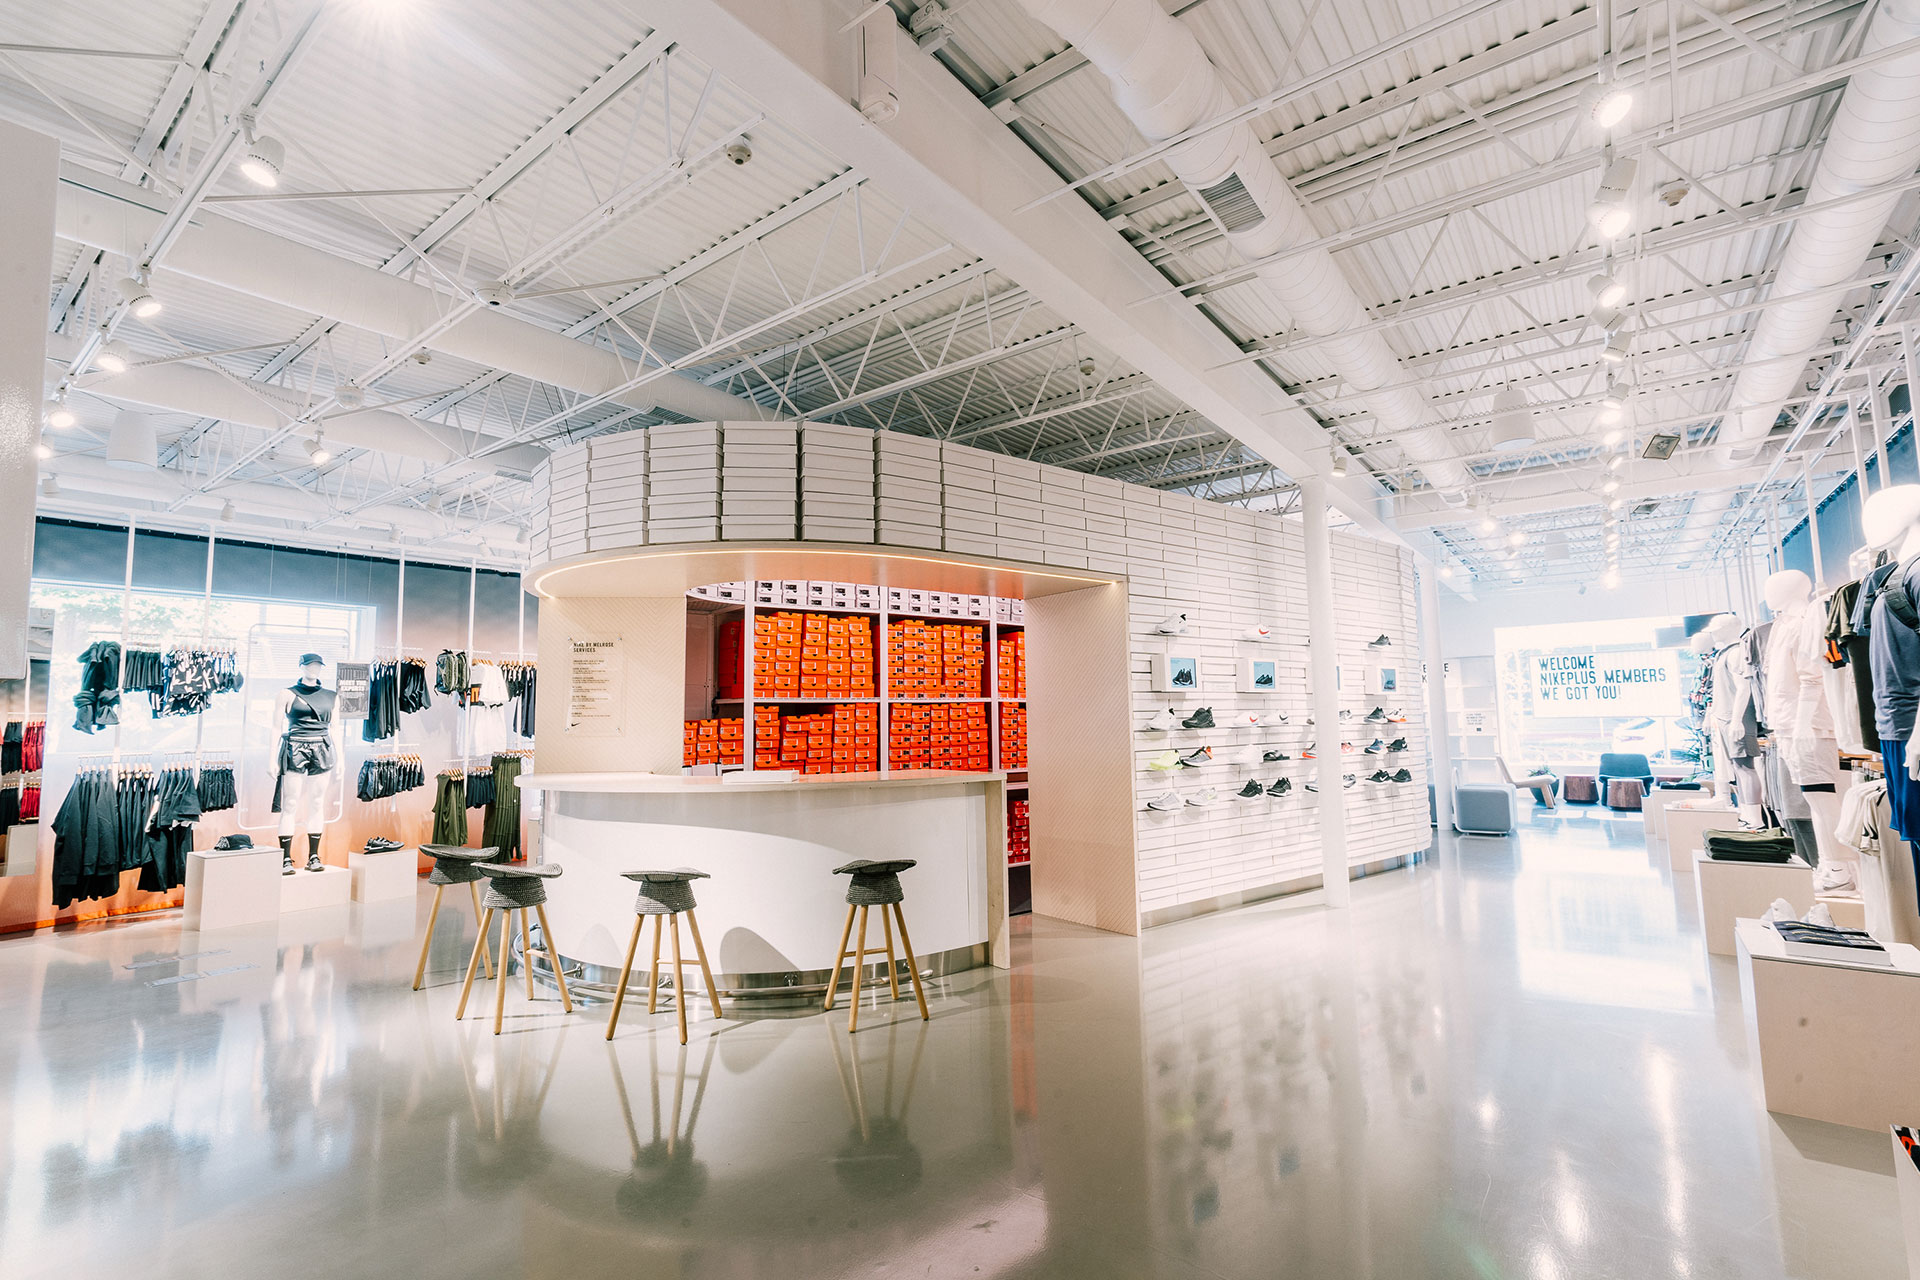 Nike 全新零售概念店背后的深度思考:本地化数据和个性化服务,实现线上线下的最佳协同效应